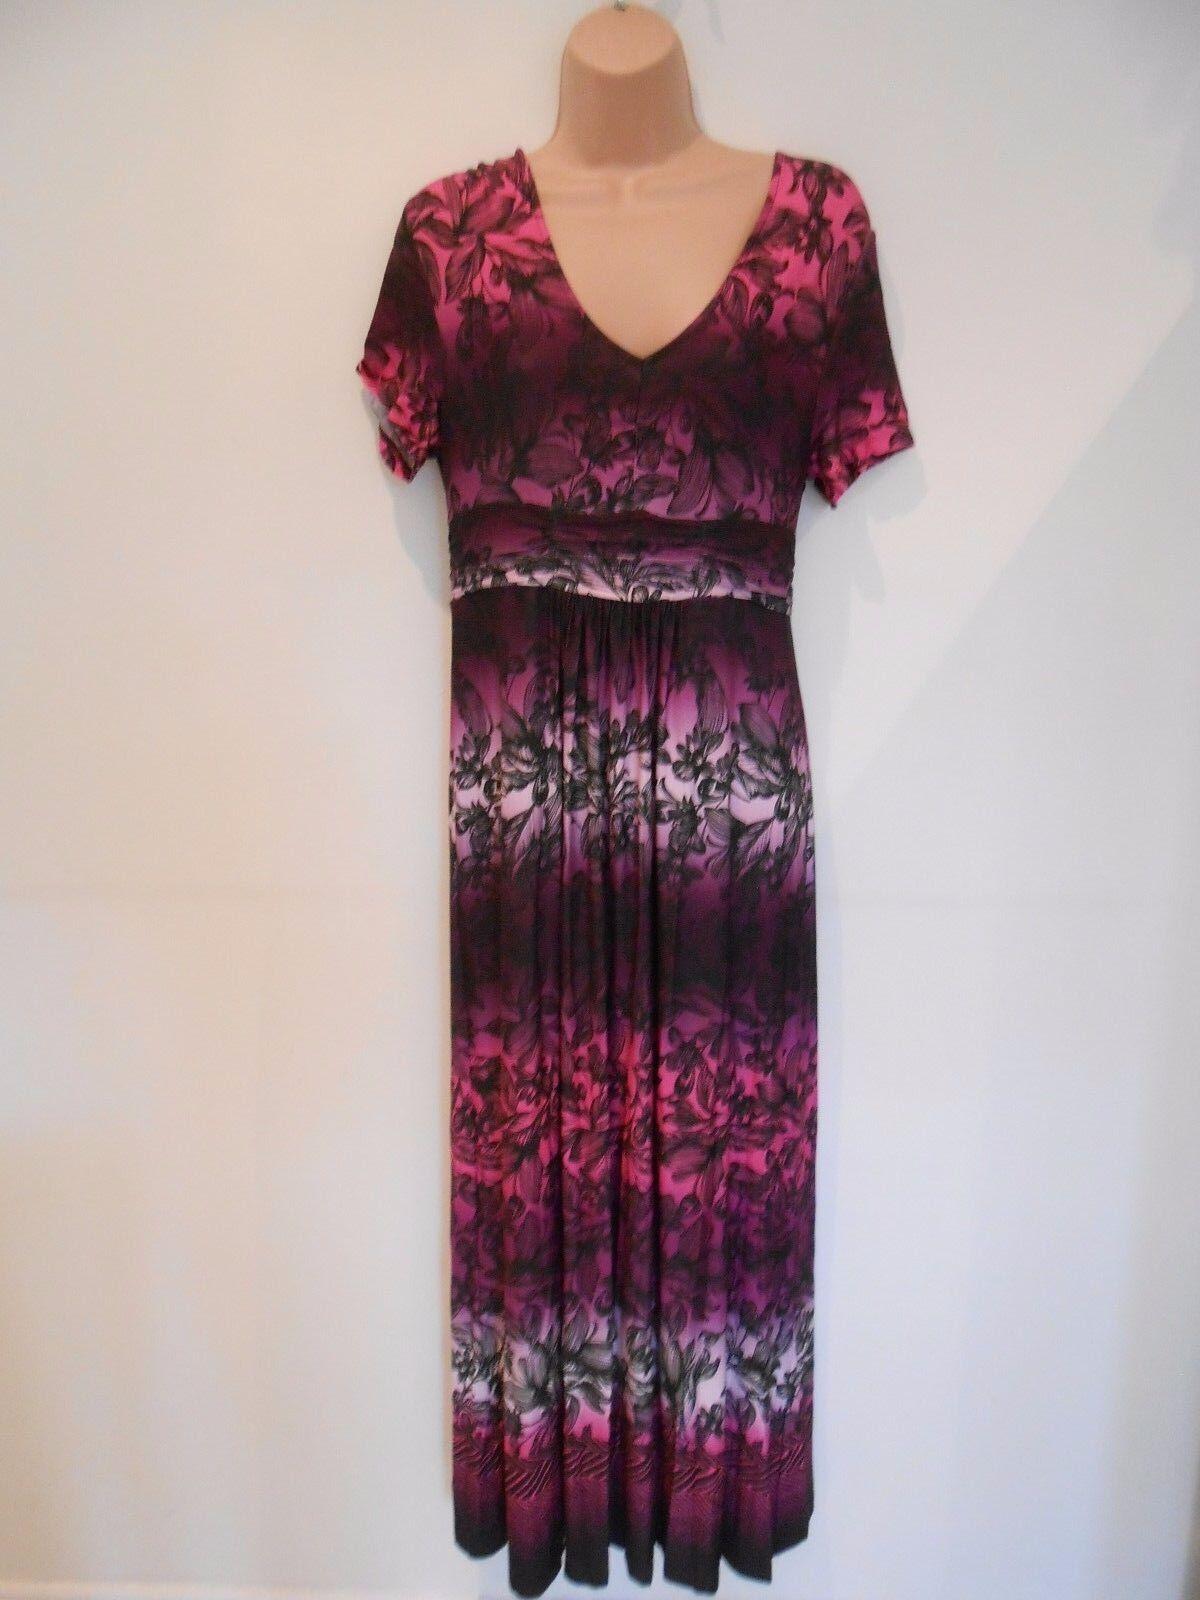 M&S Per Una Summer Holiday Printed Long Maxi Dress (NEW) Size 10 ()